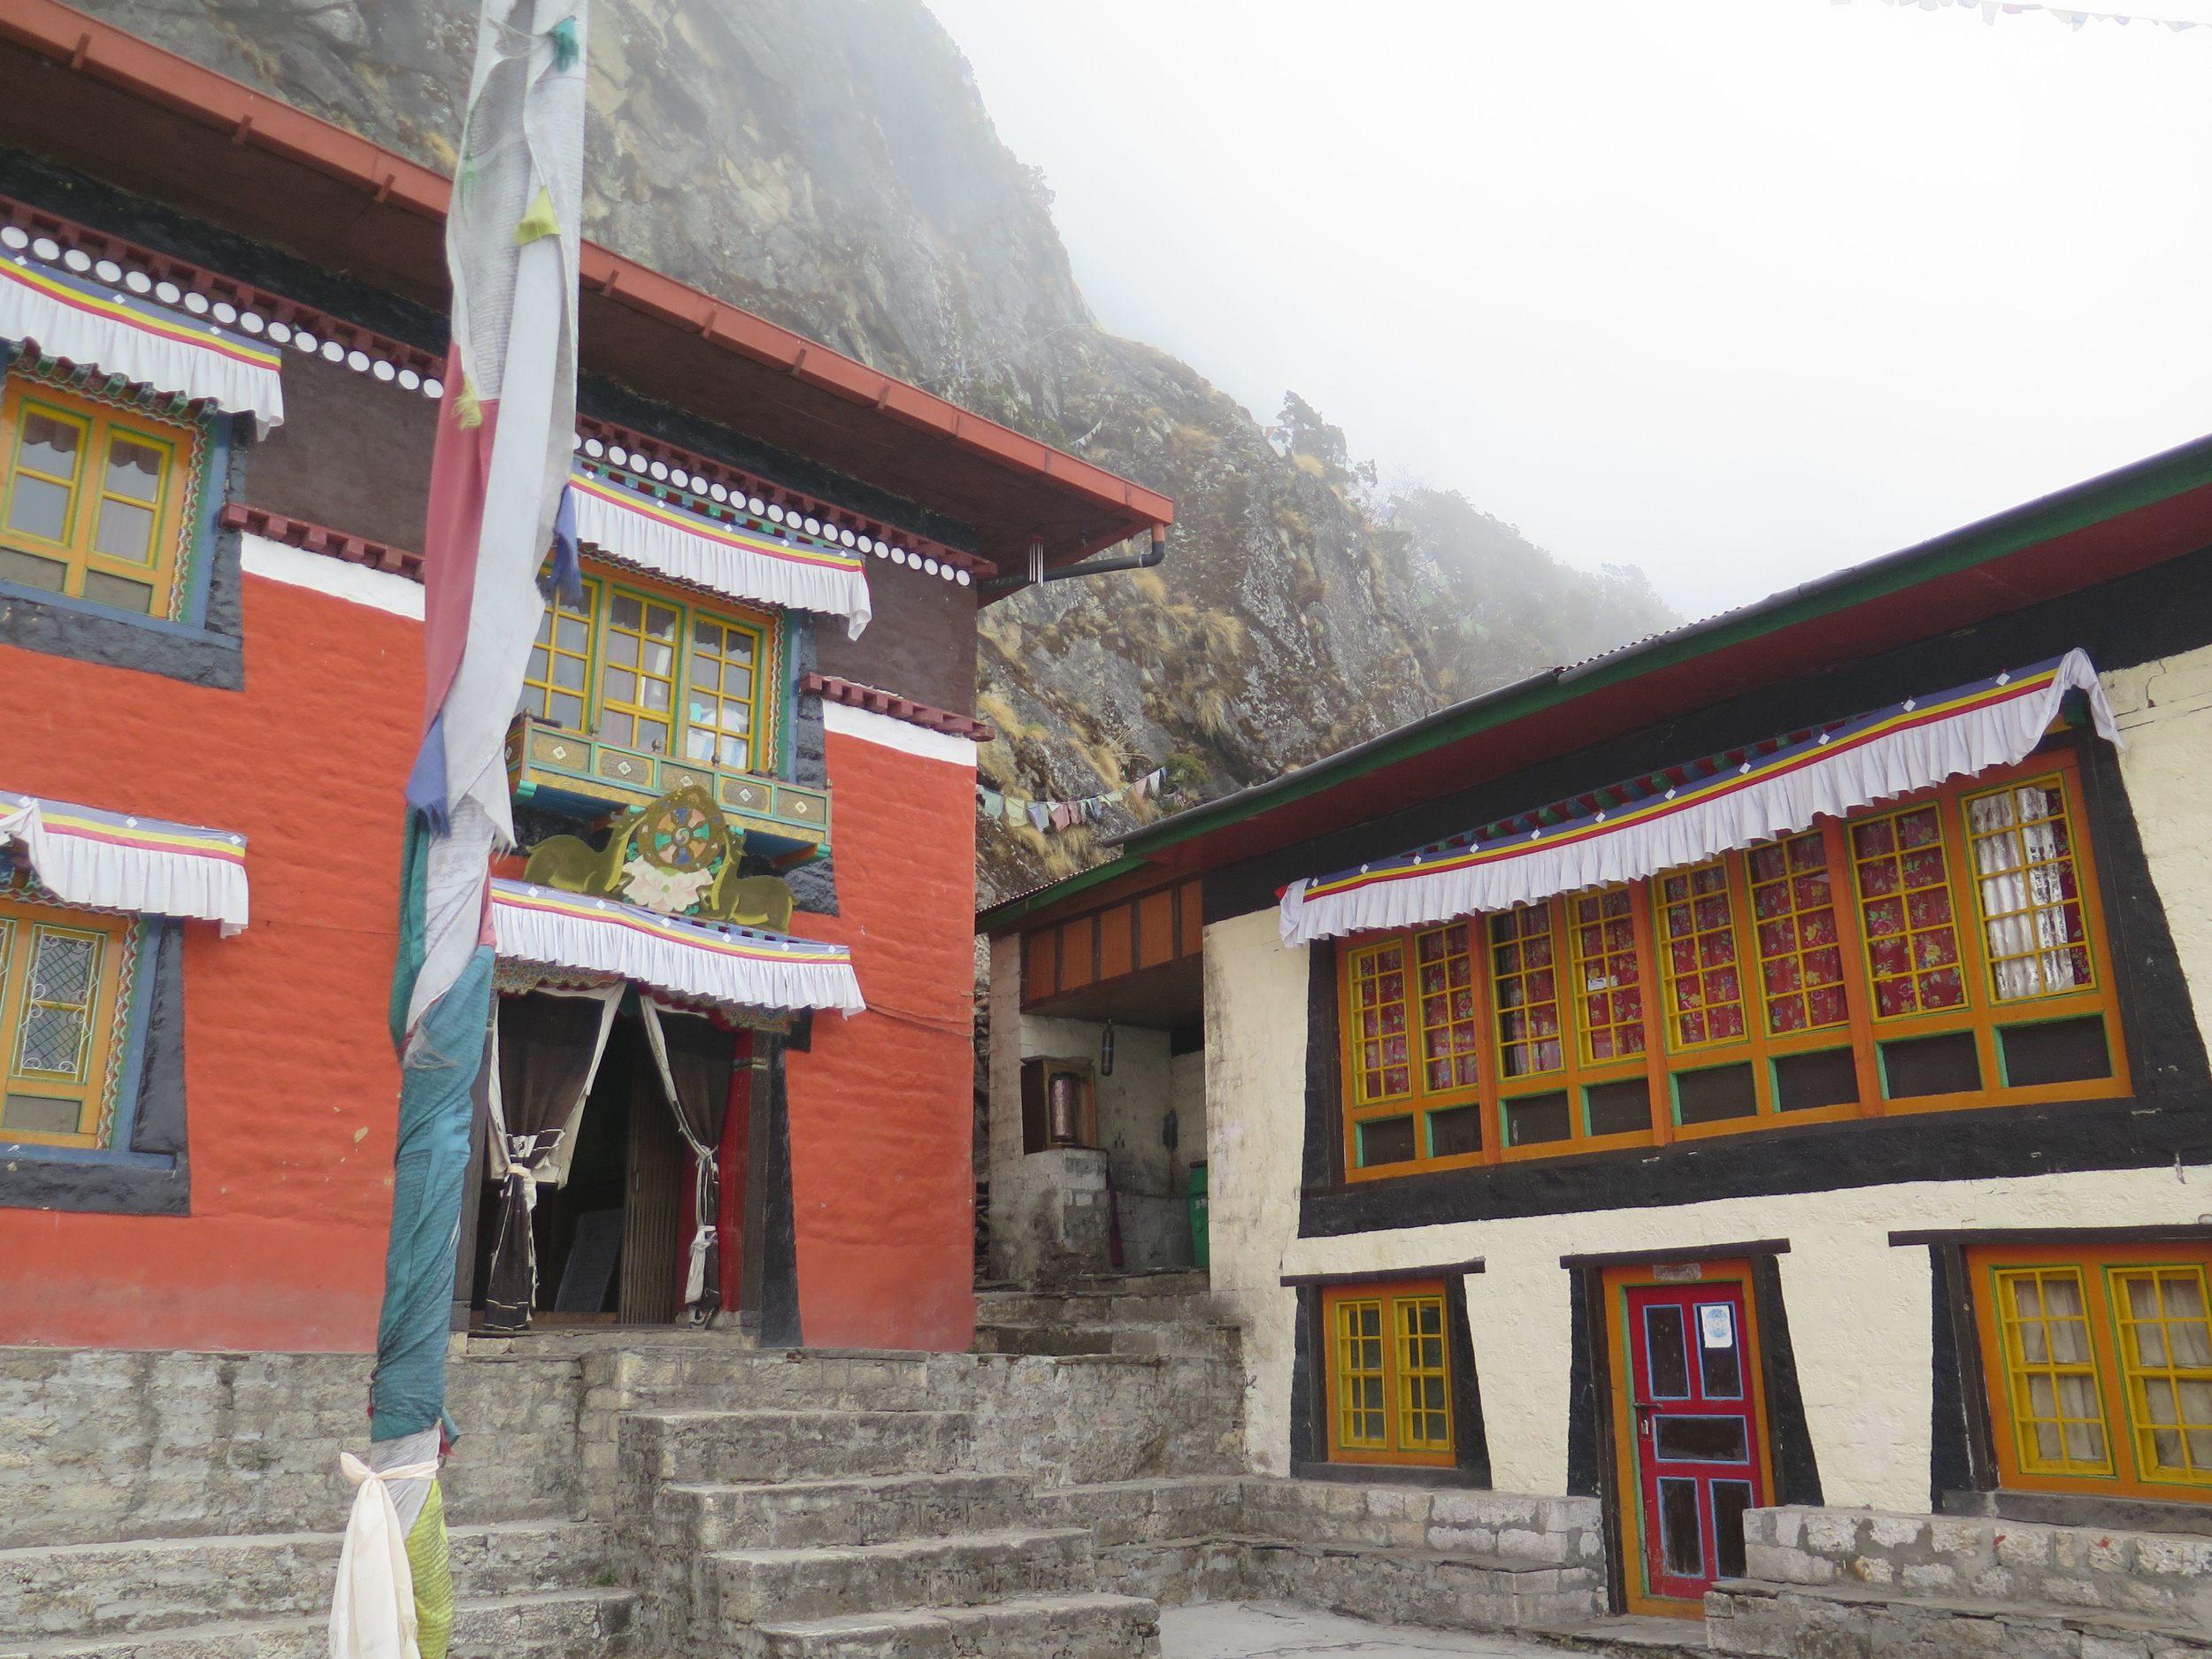 Manastir / Monastery